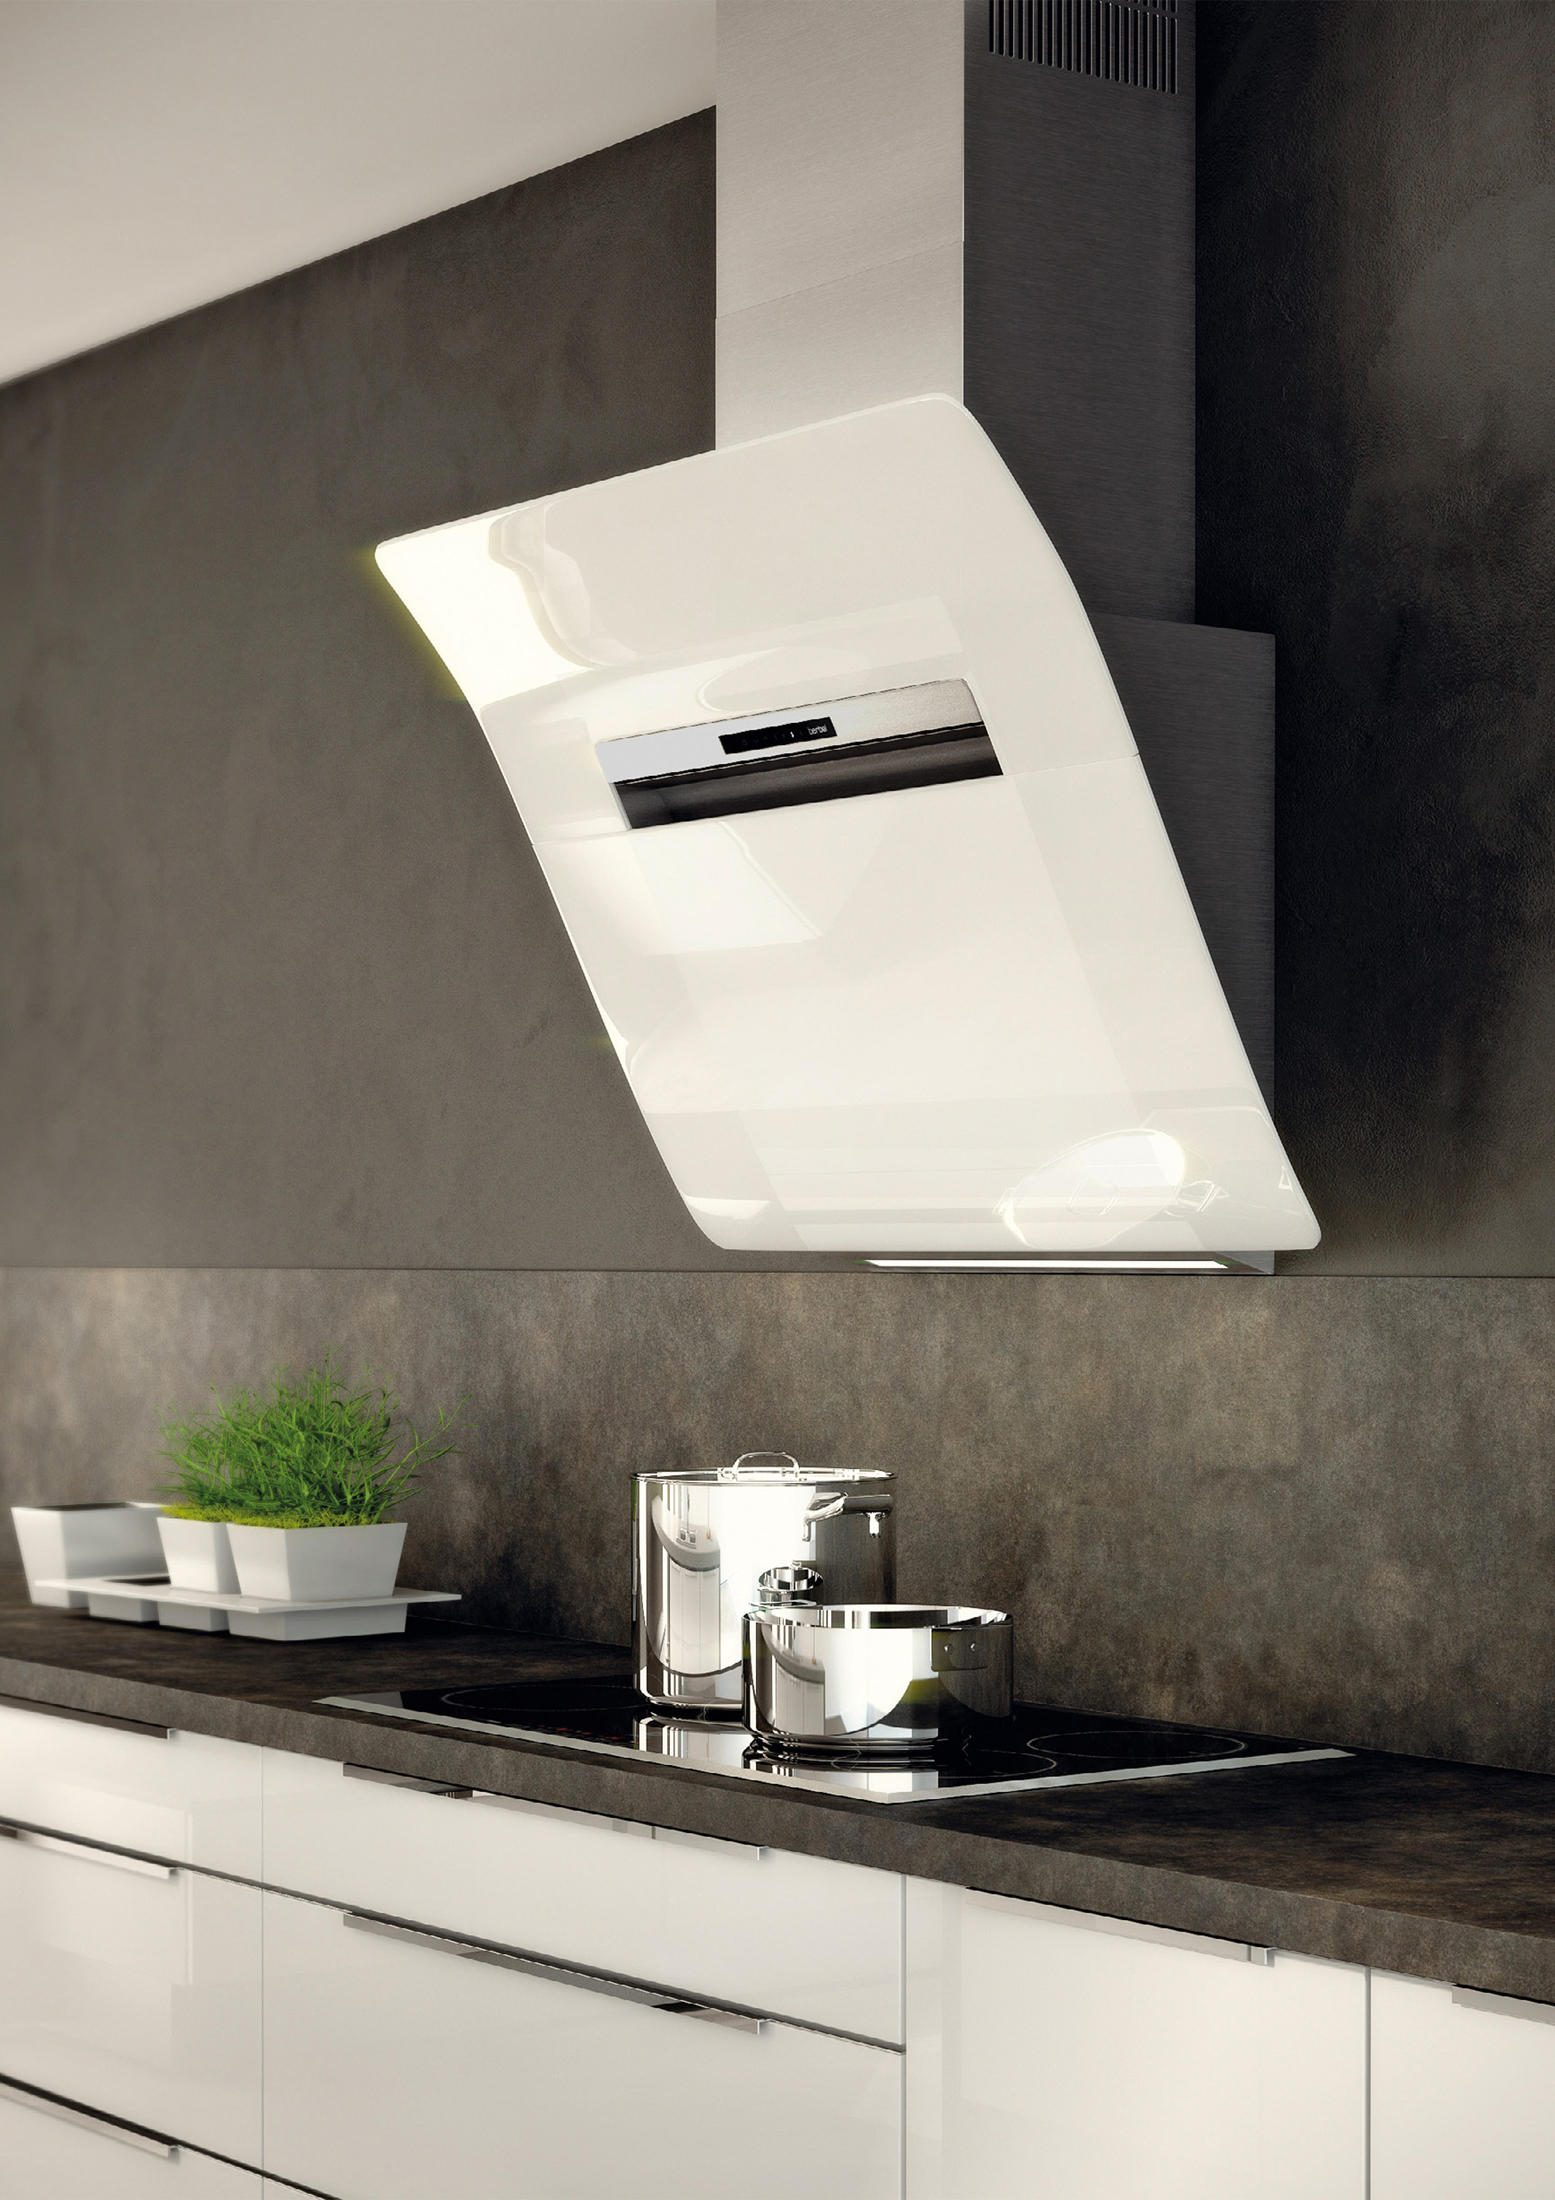 kopffreihaube bkh gl k chenabzugshauben von berbel architonic. Black Bedroom Furniture Sets. Home Design Ideas